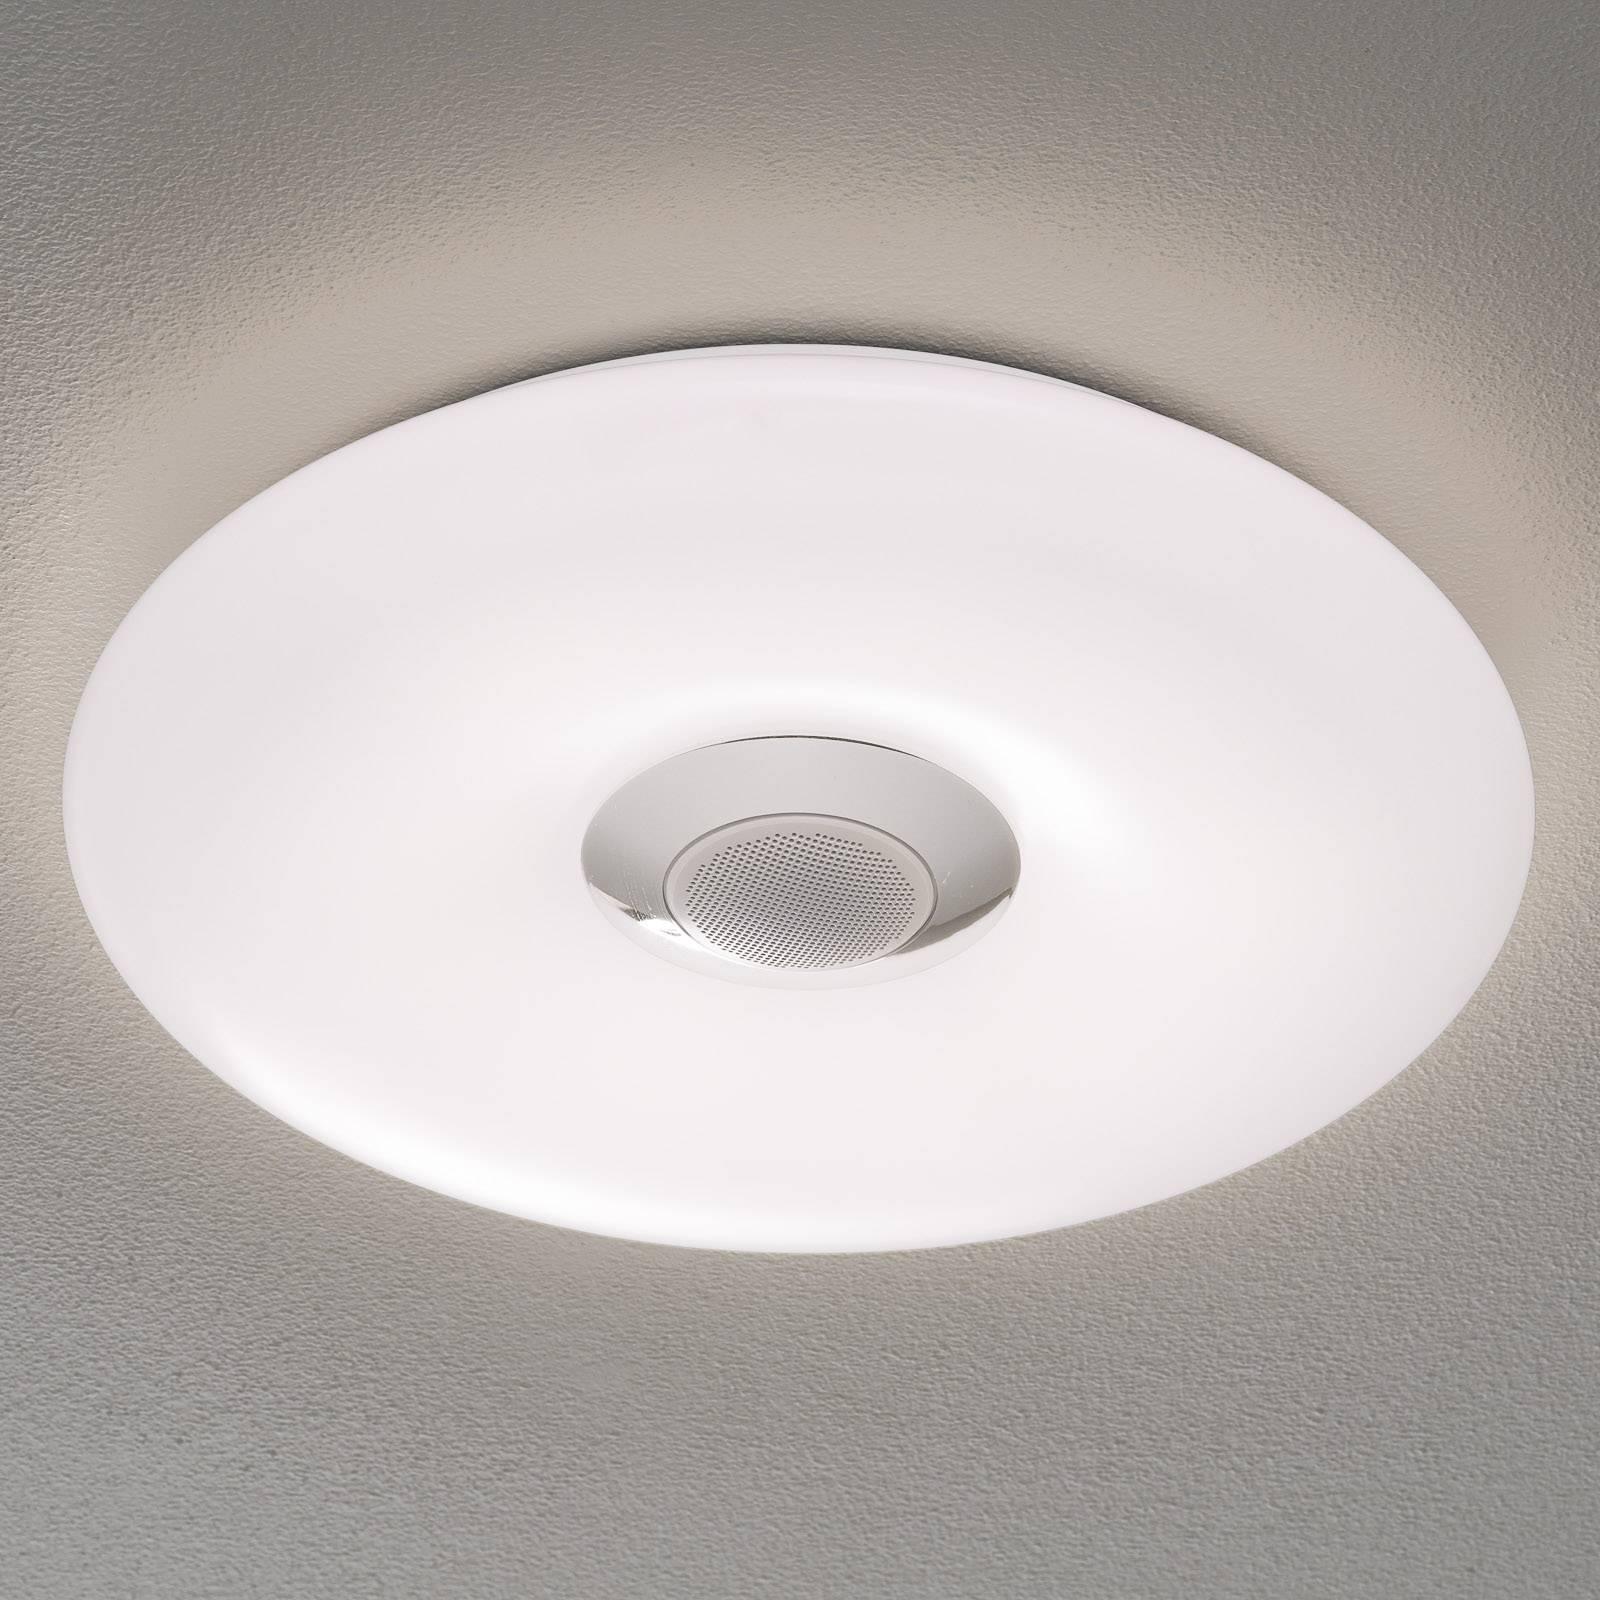 Nashville - Led plafondlamp met luidspreker